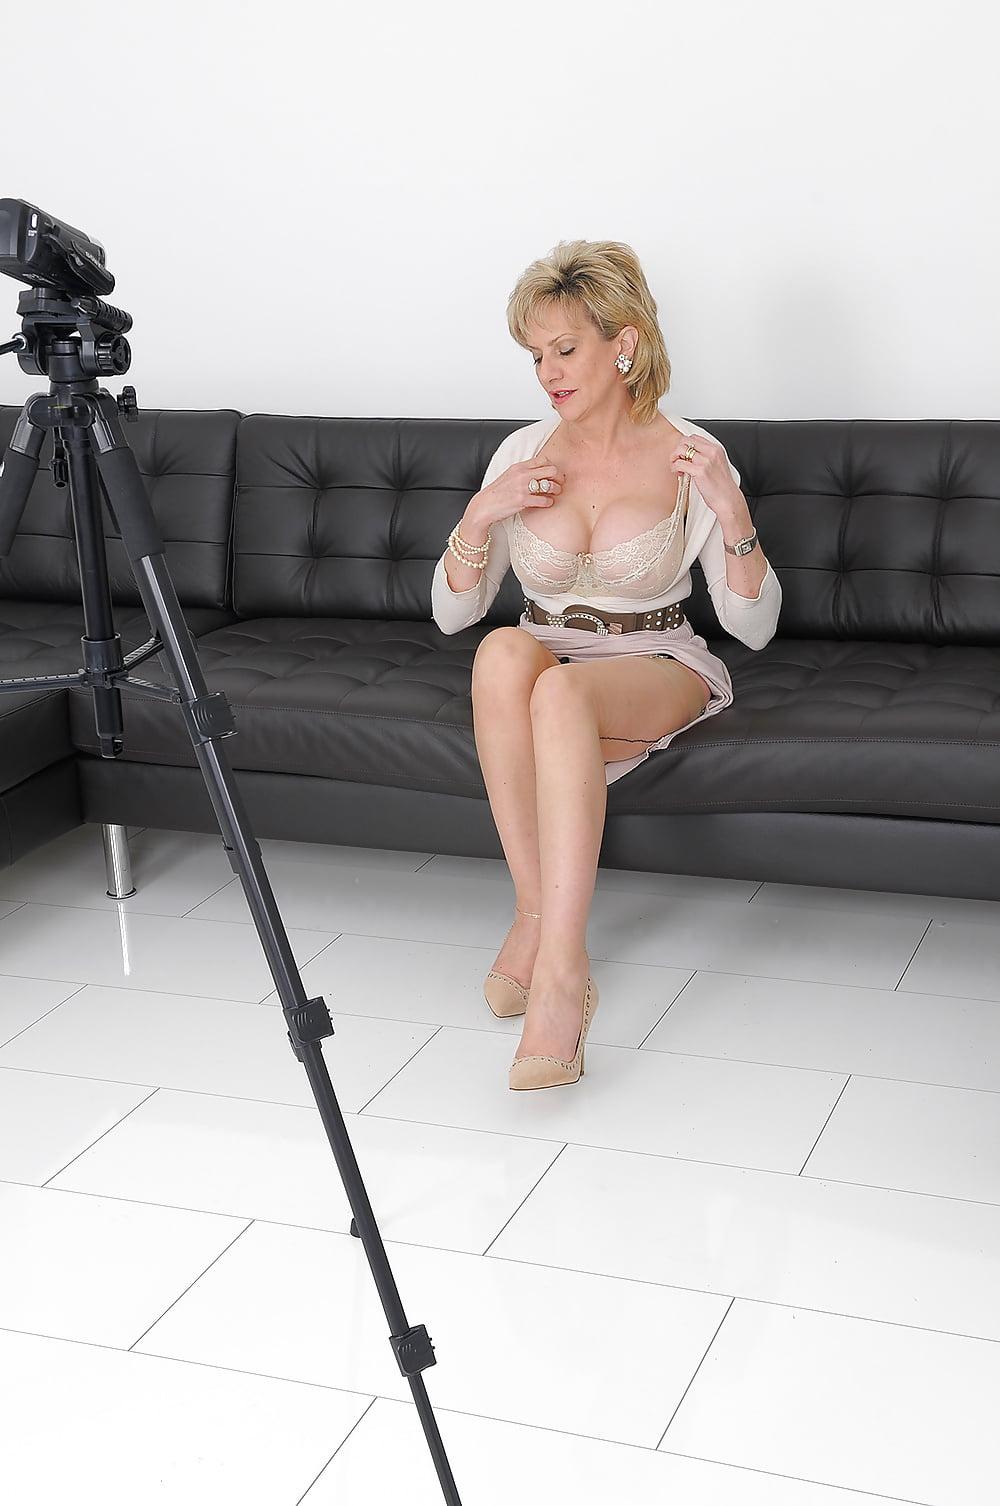 Sexy lady video sexy lady video